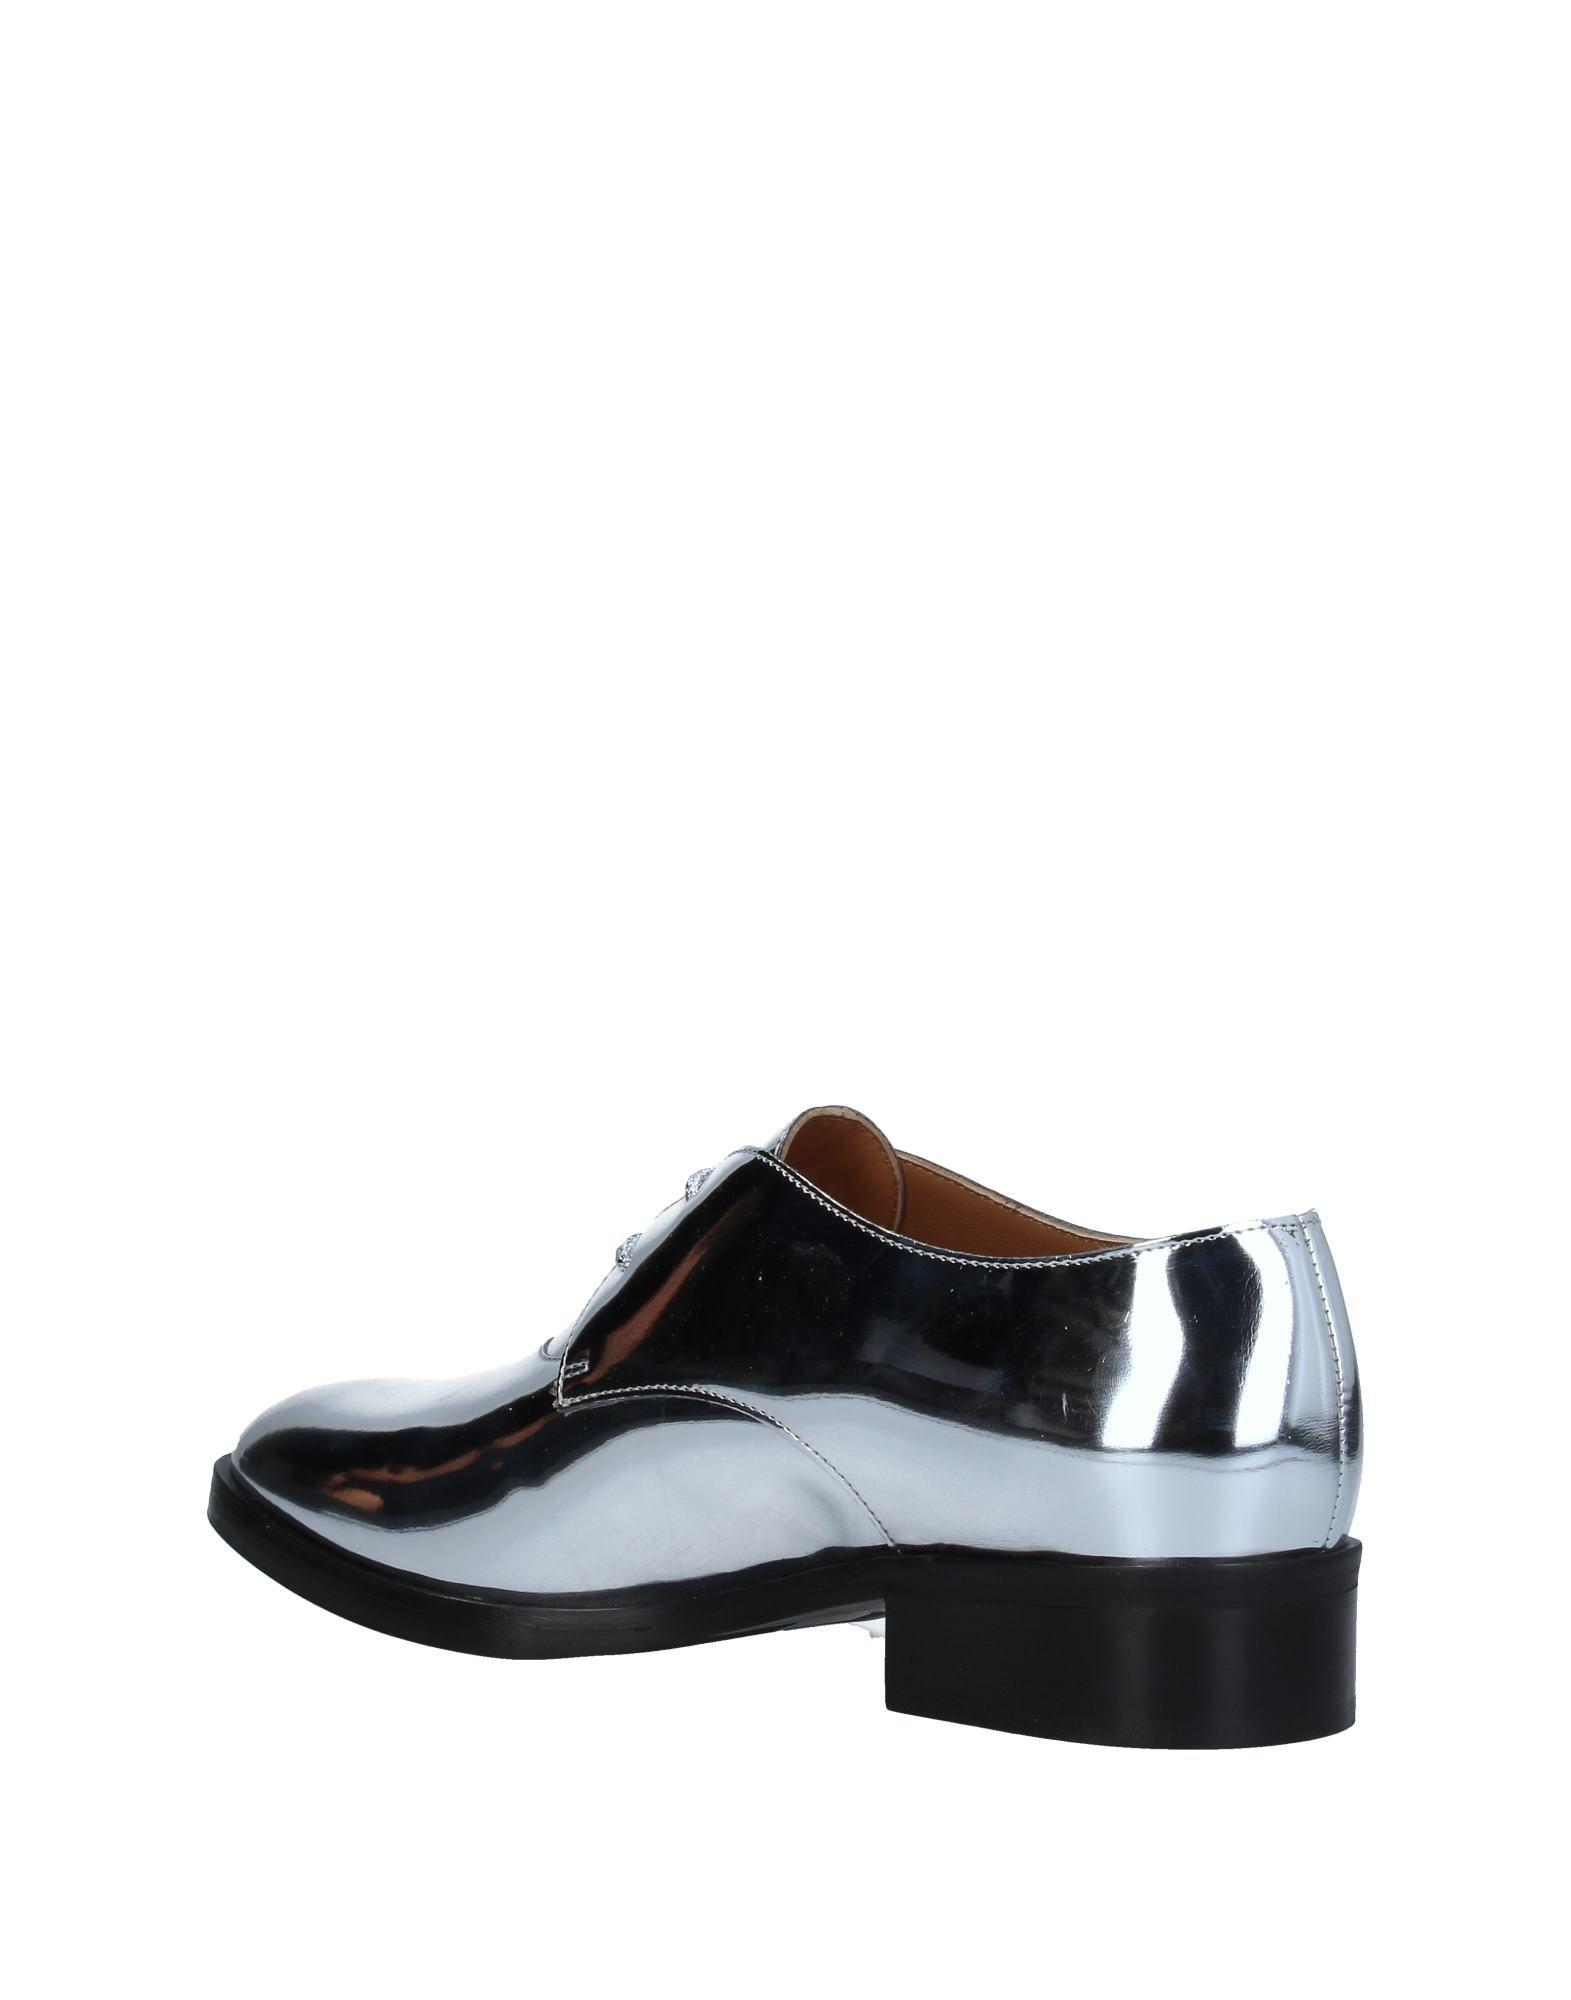 Raoul Chaussures À Lacets I7vJ3qS